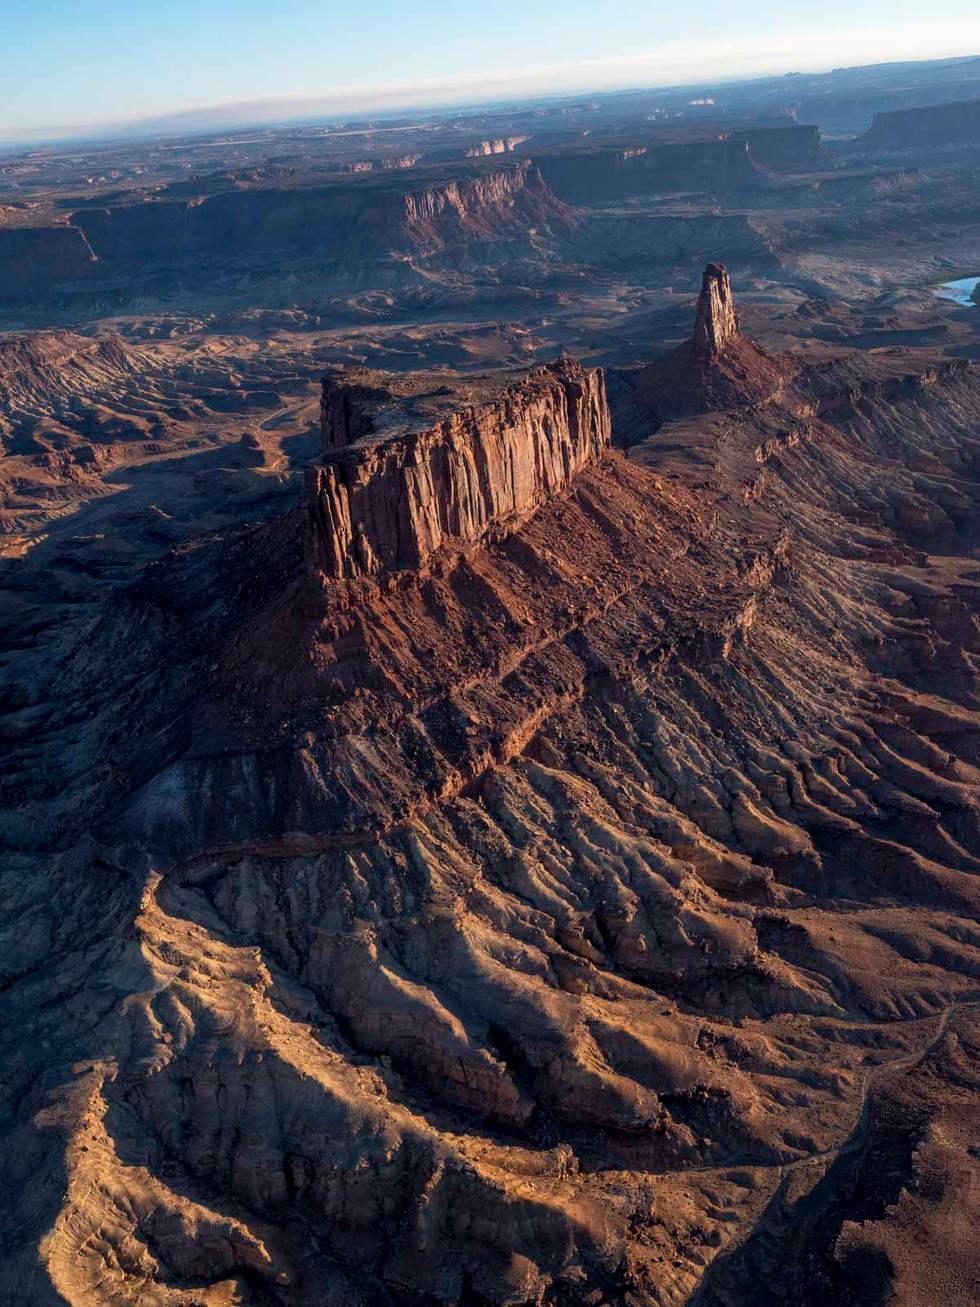 'Kingdom',  Canyonlands, Moab, Utah